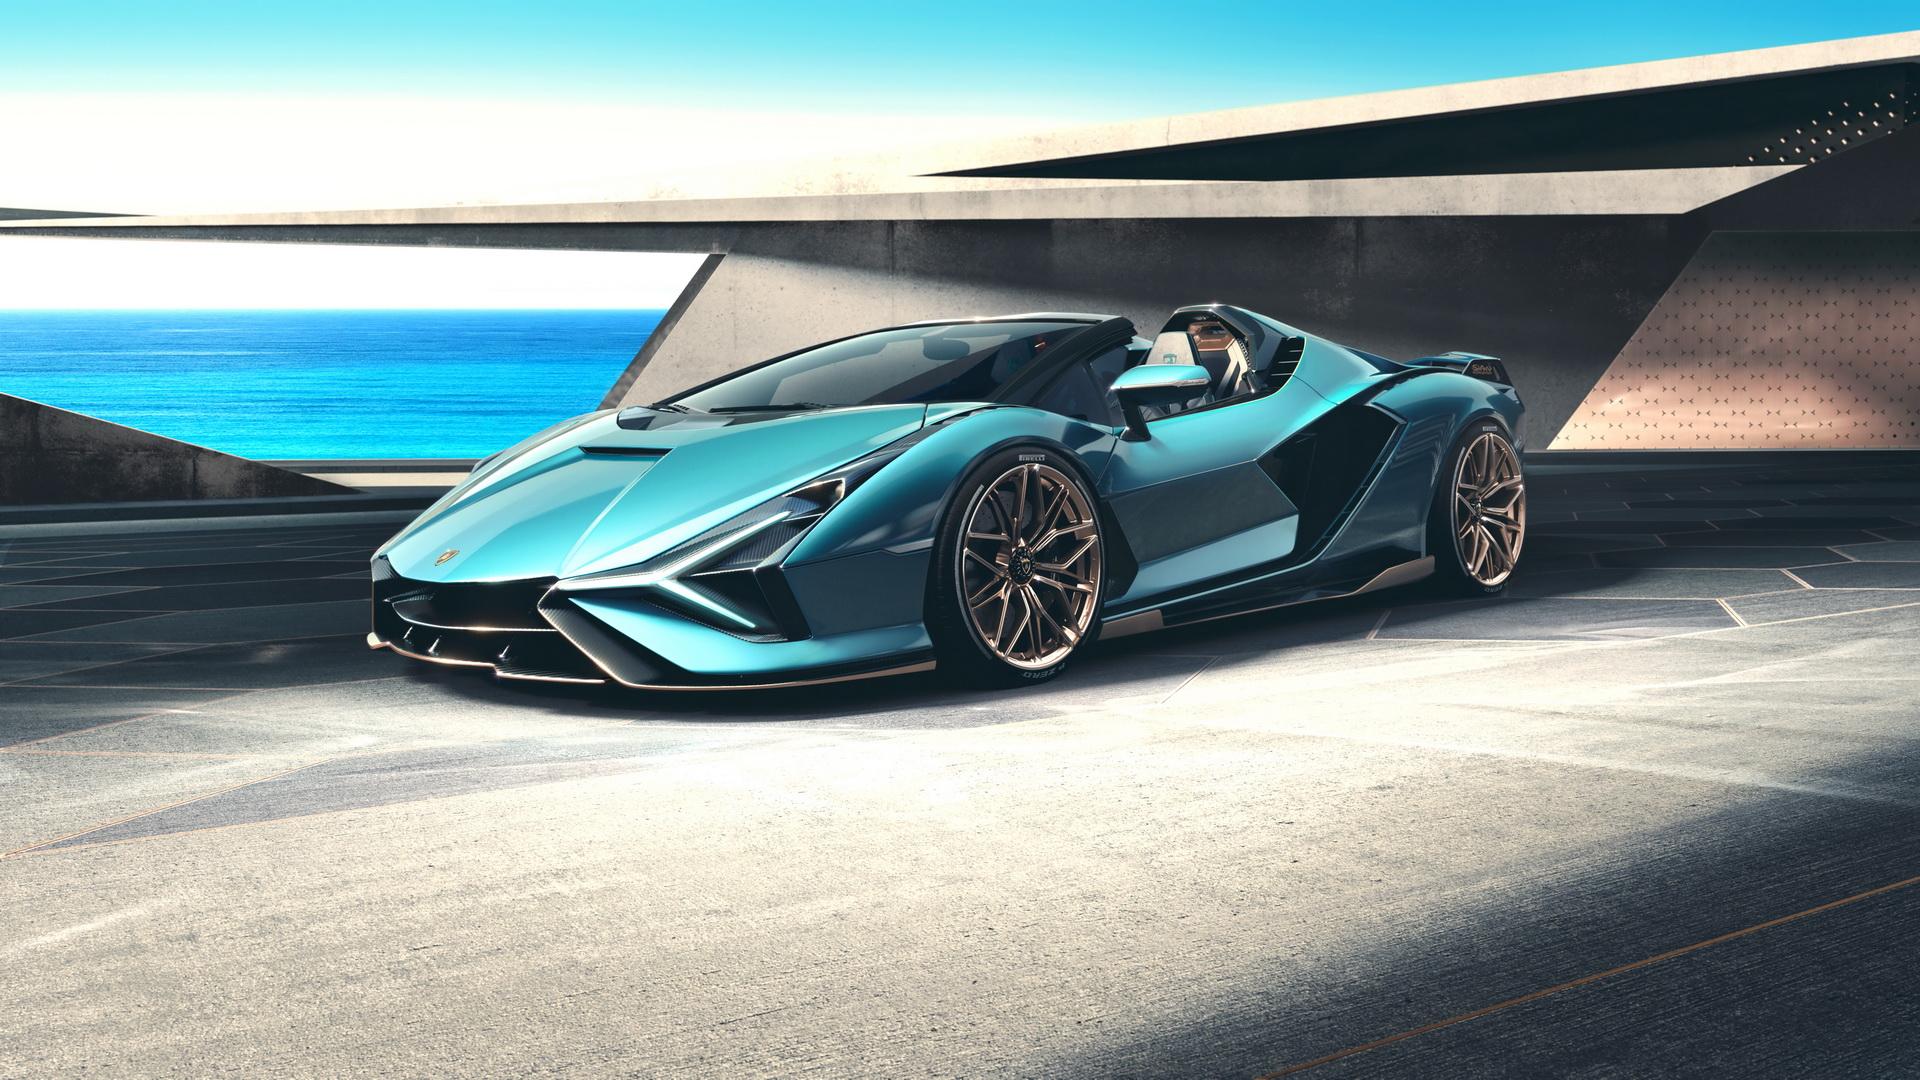 Lamborghini-Sian-Roadster-1-1